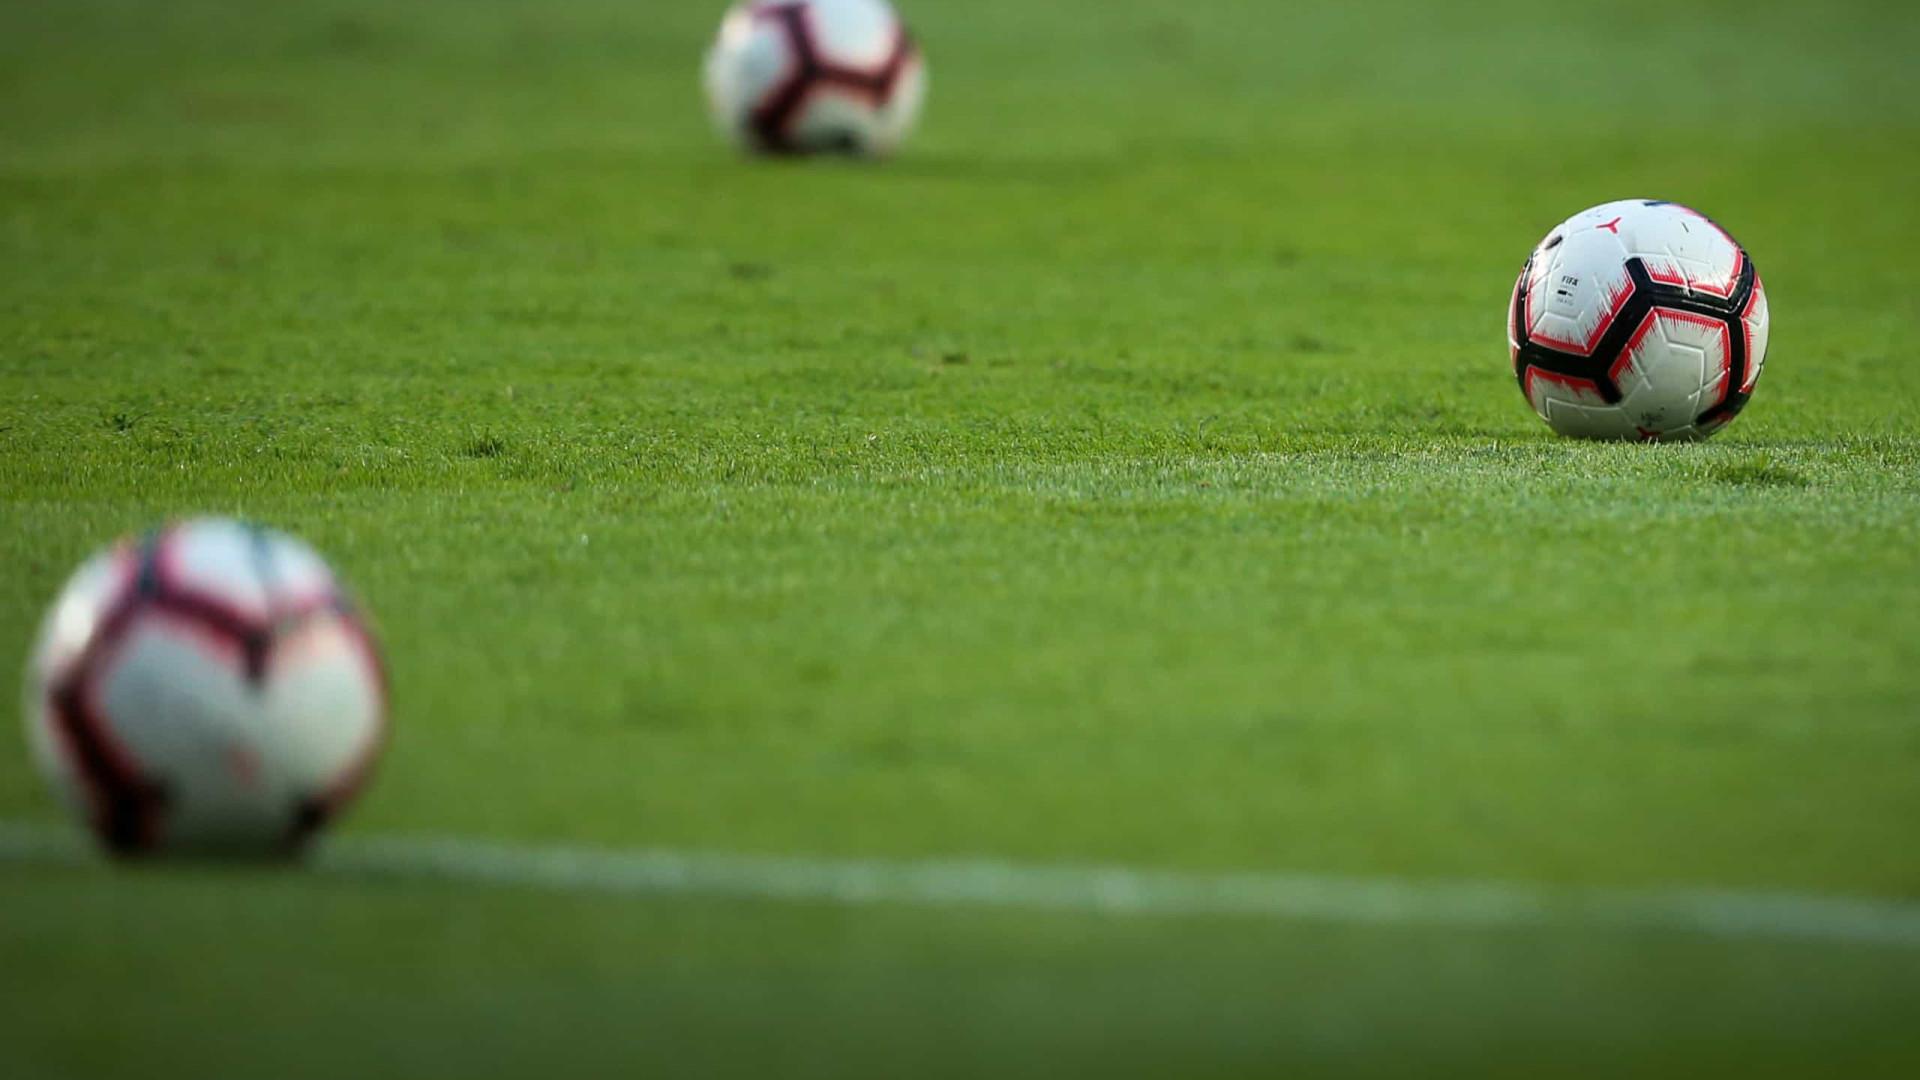 Moreirense recebe Portimonense após triunfo histórico no estádio da Luz